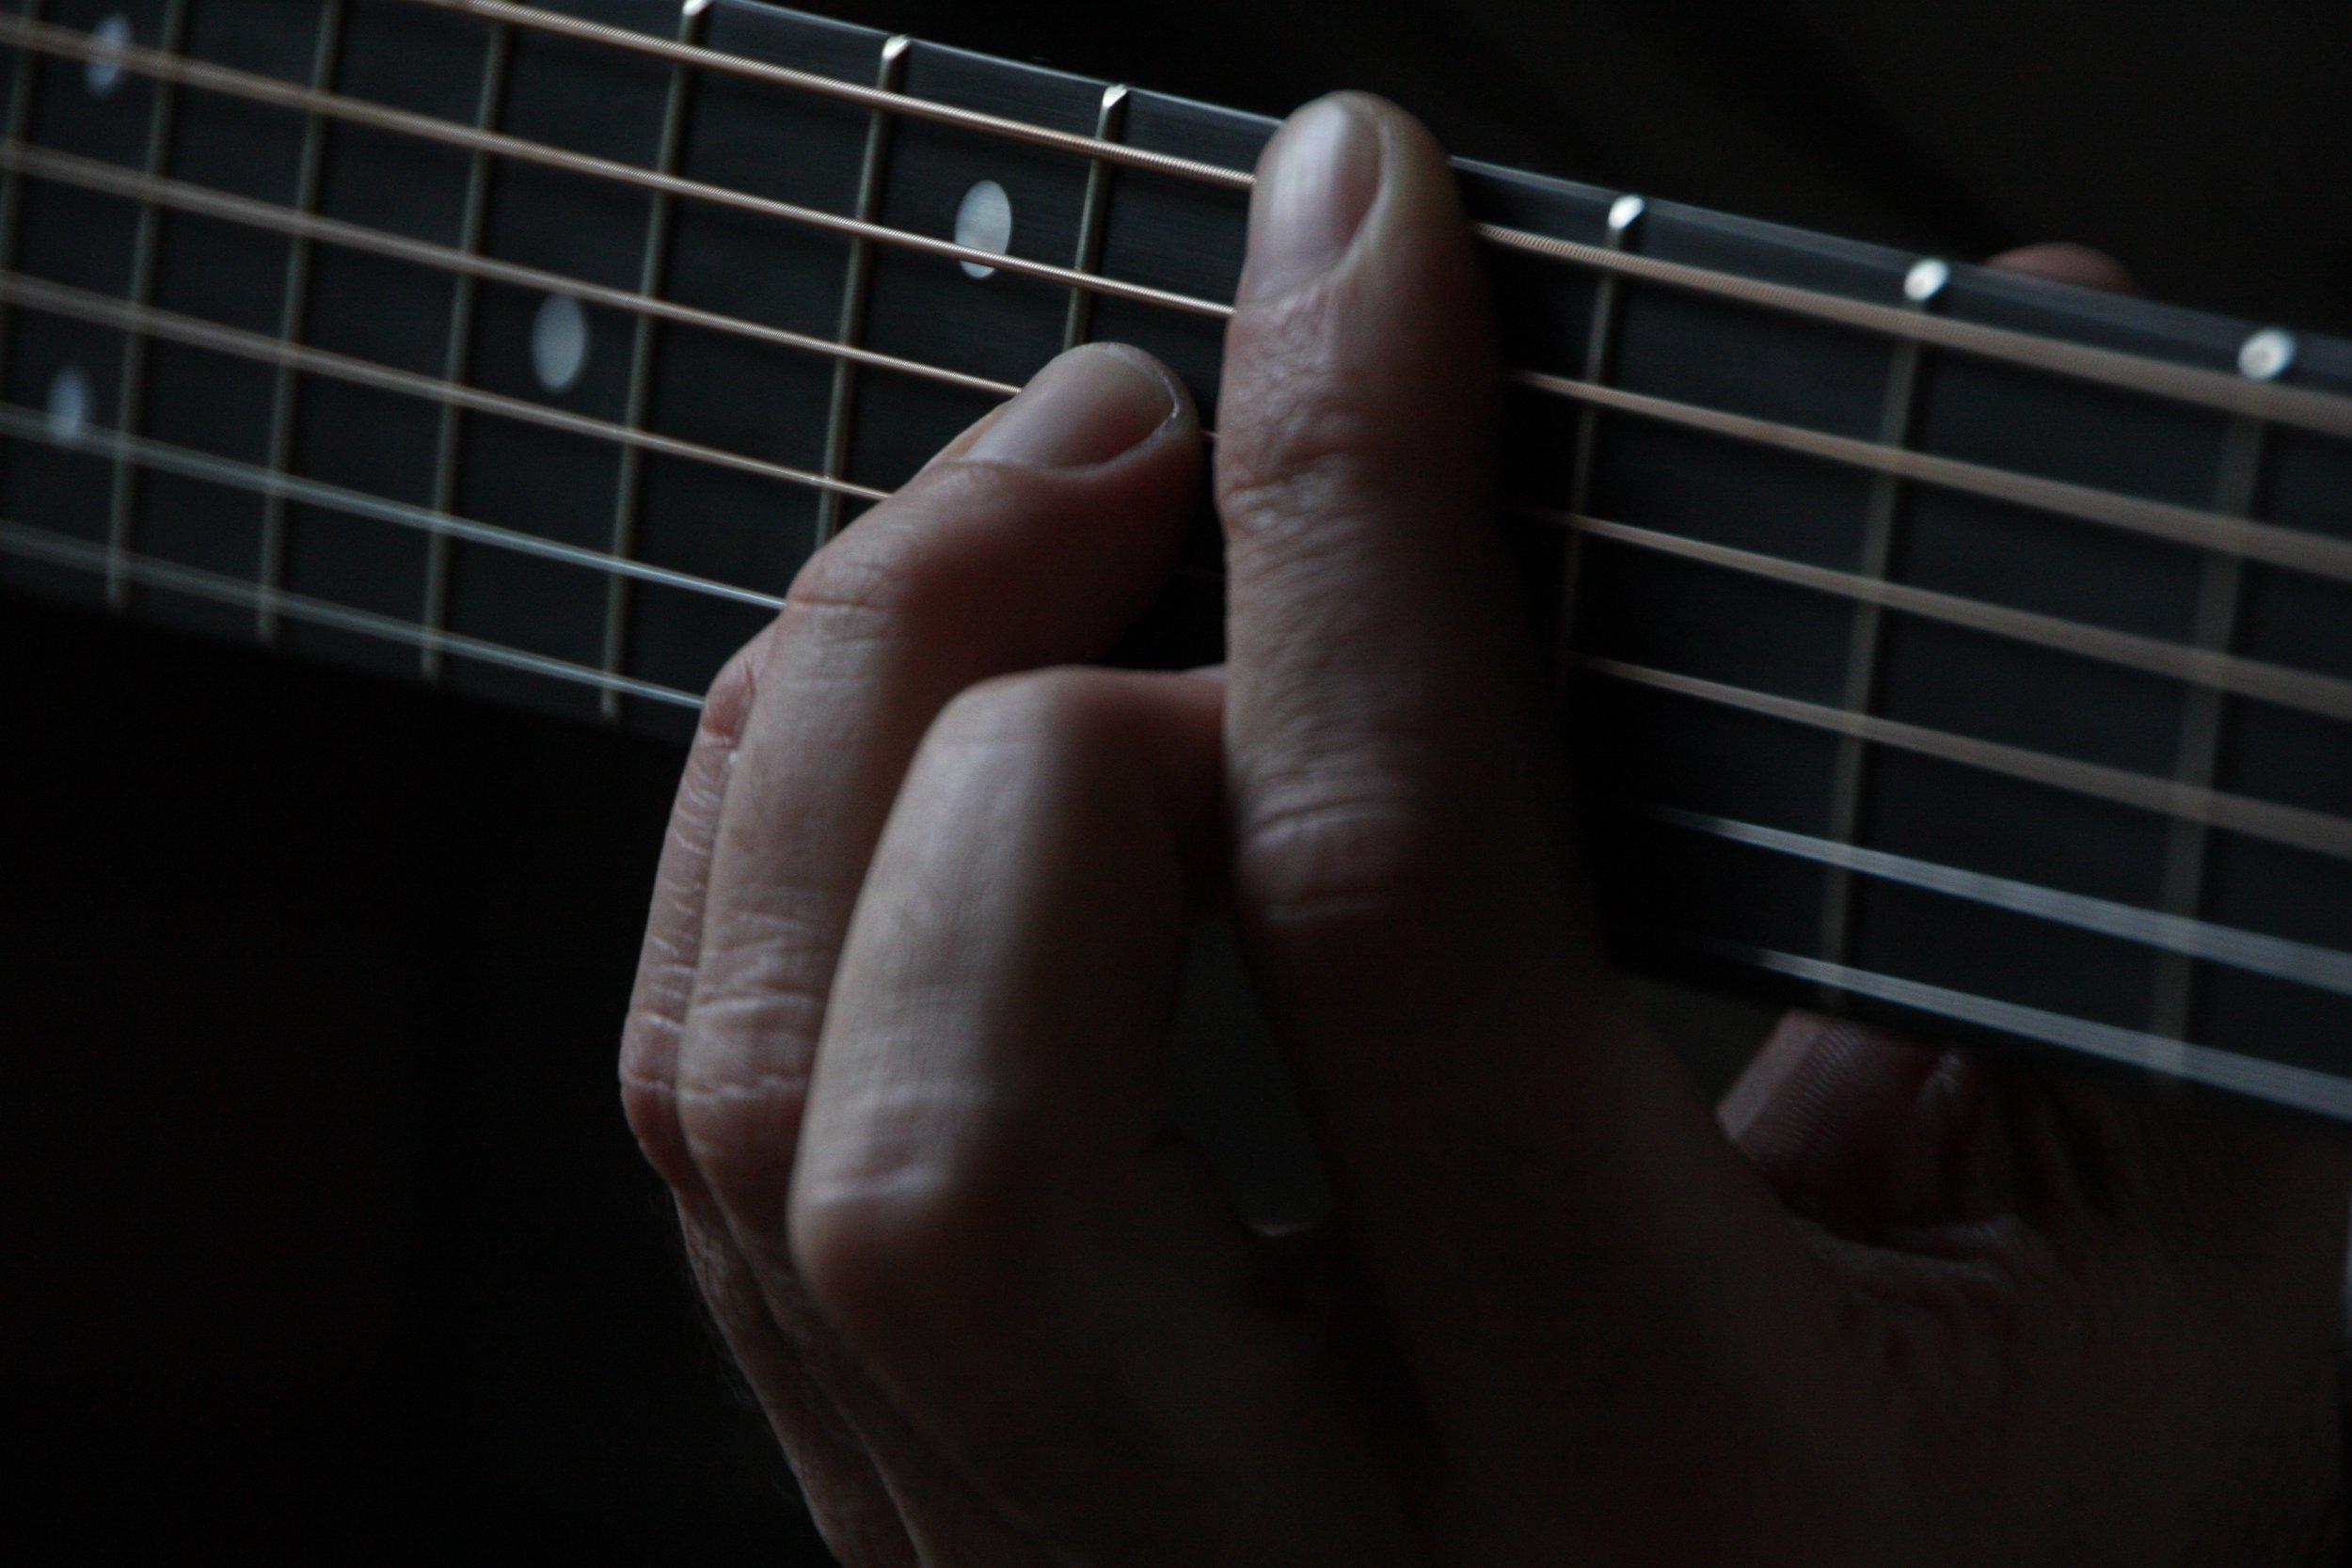 fingers close up guitar.jpg